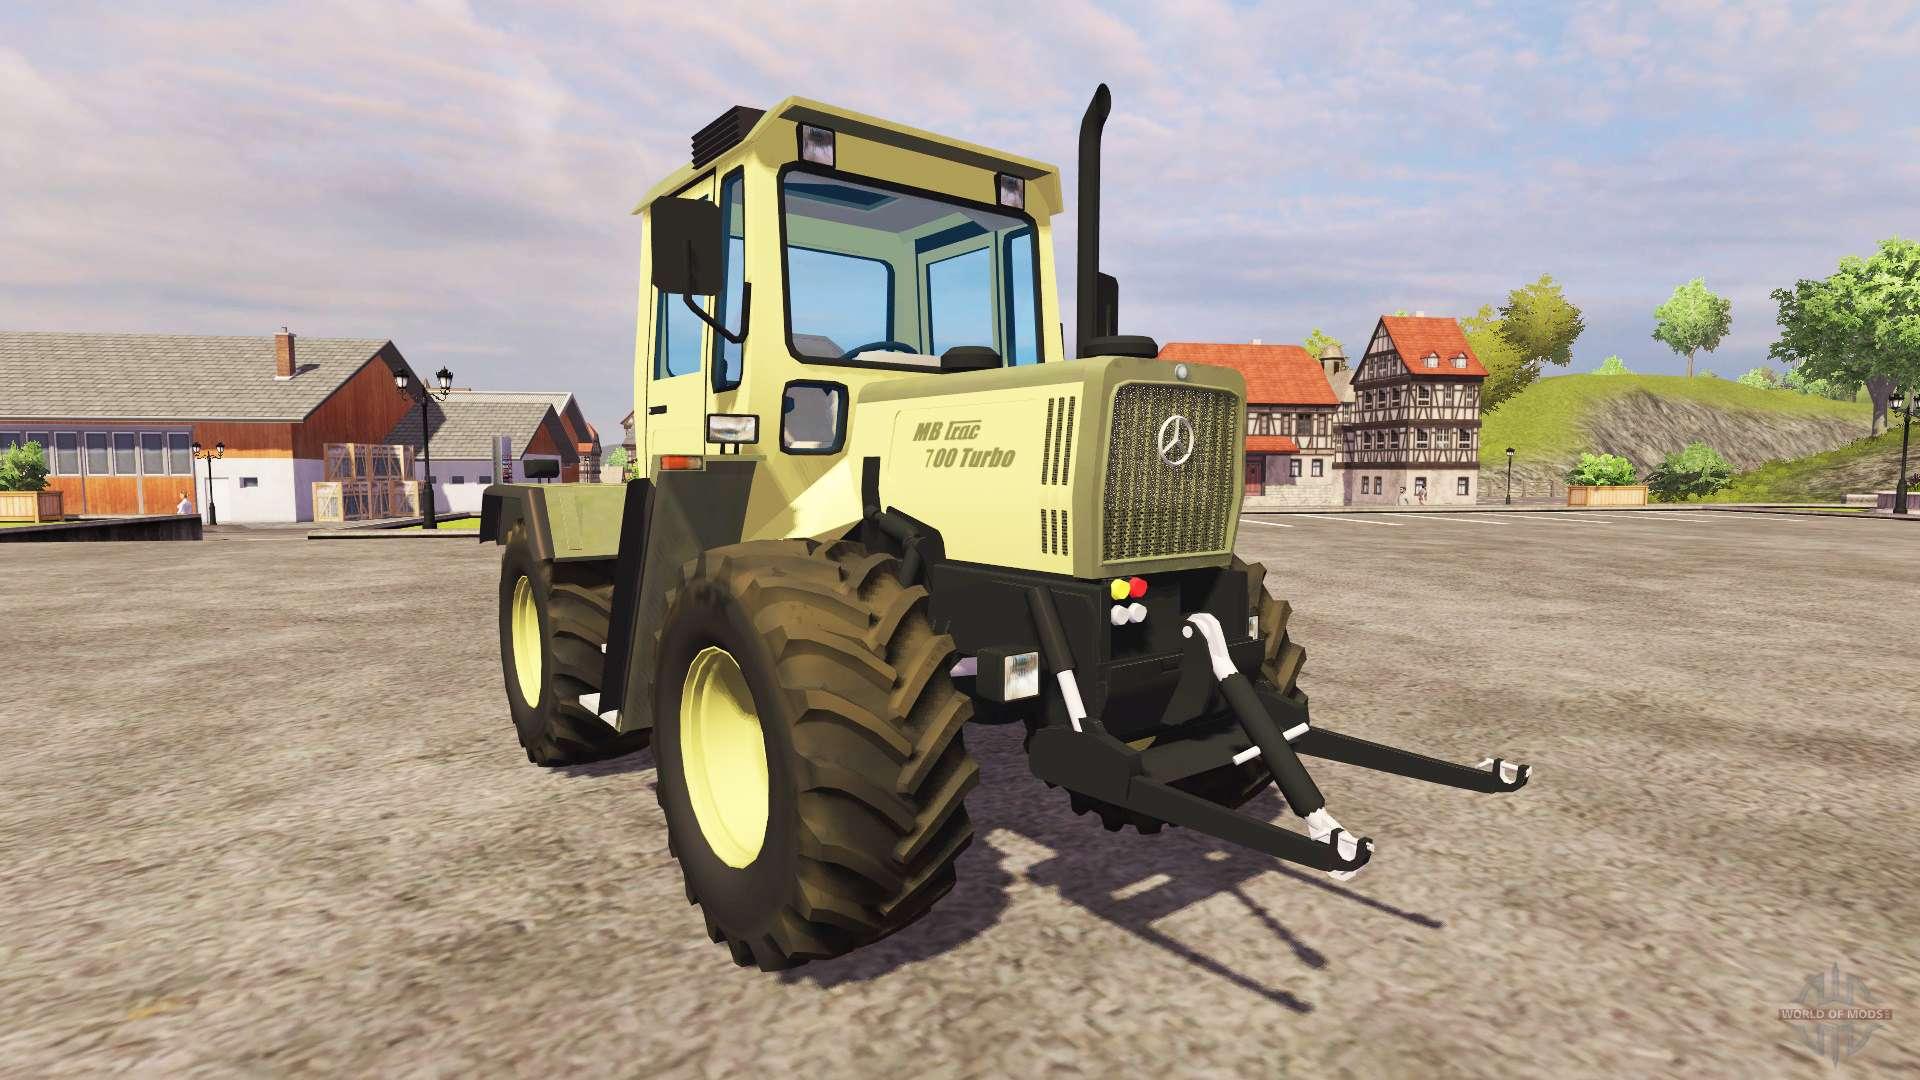 mercedes benz trac 700 turbo for farming simulator 2013. Black Bedroom Furniture Sets. Home Design Ideas